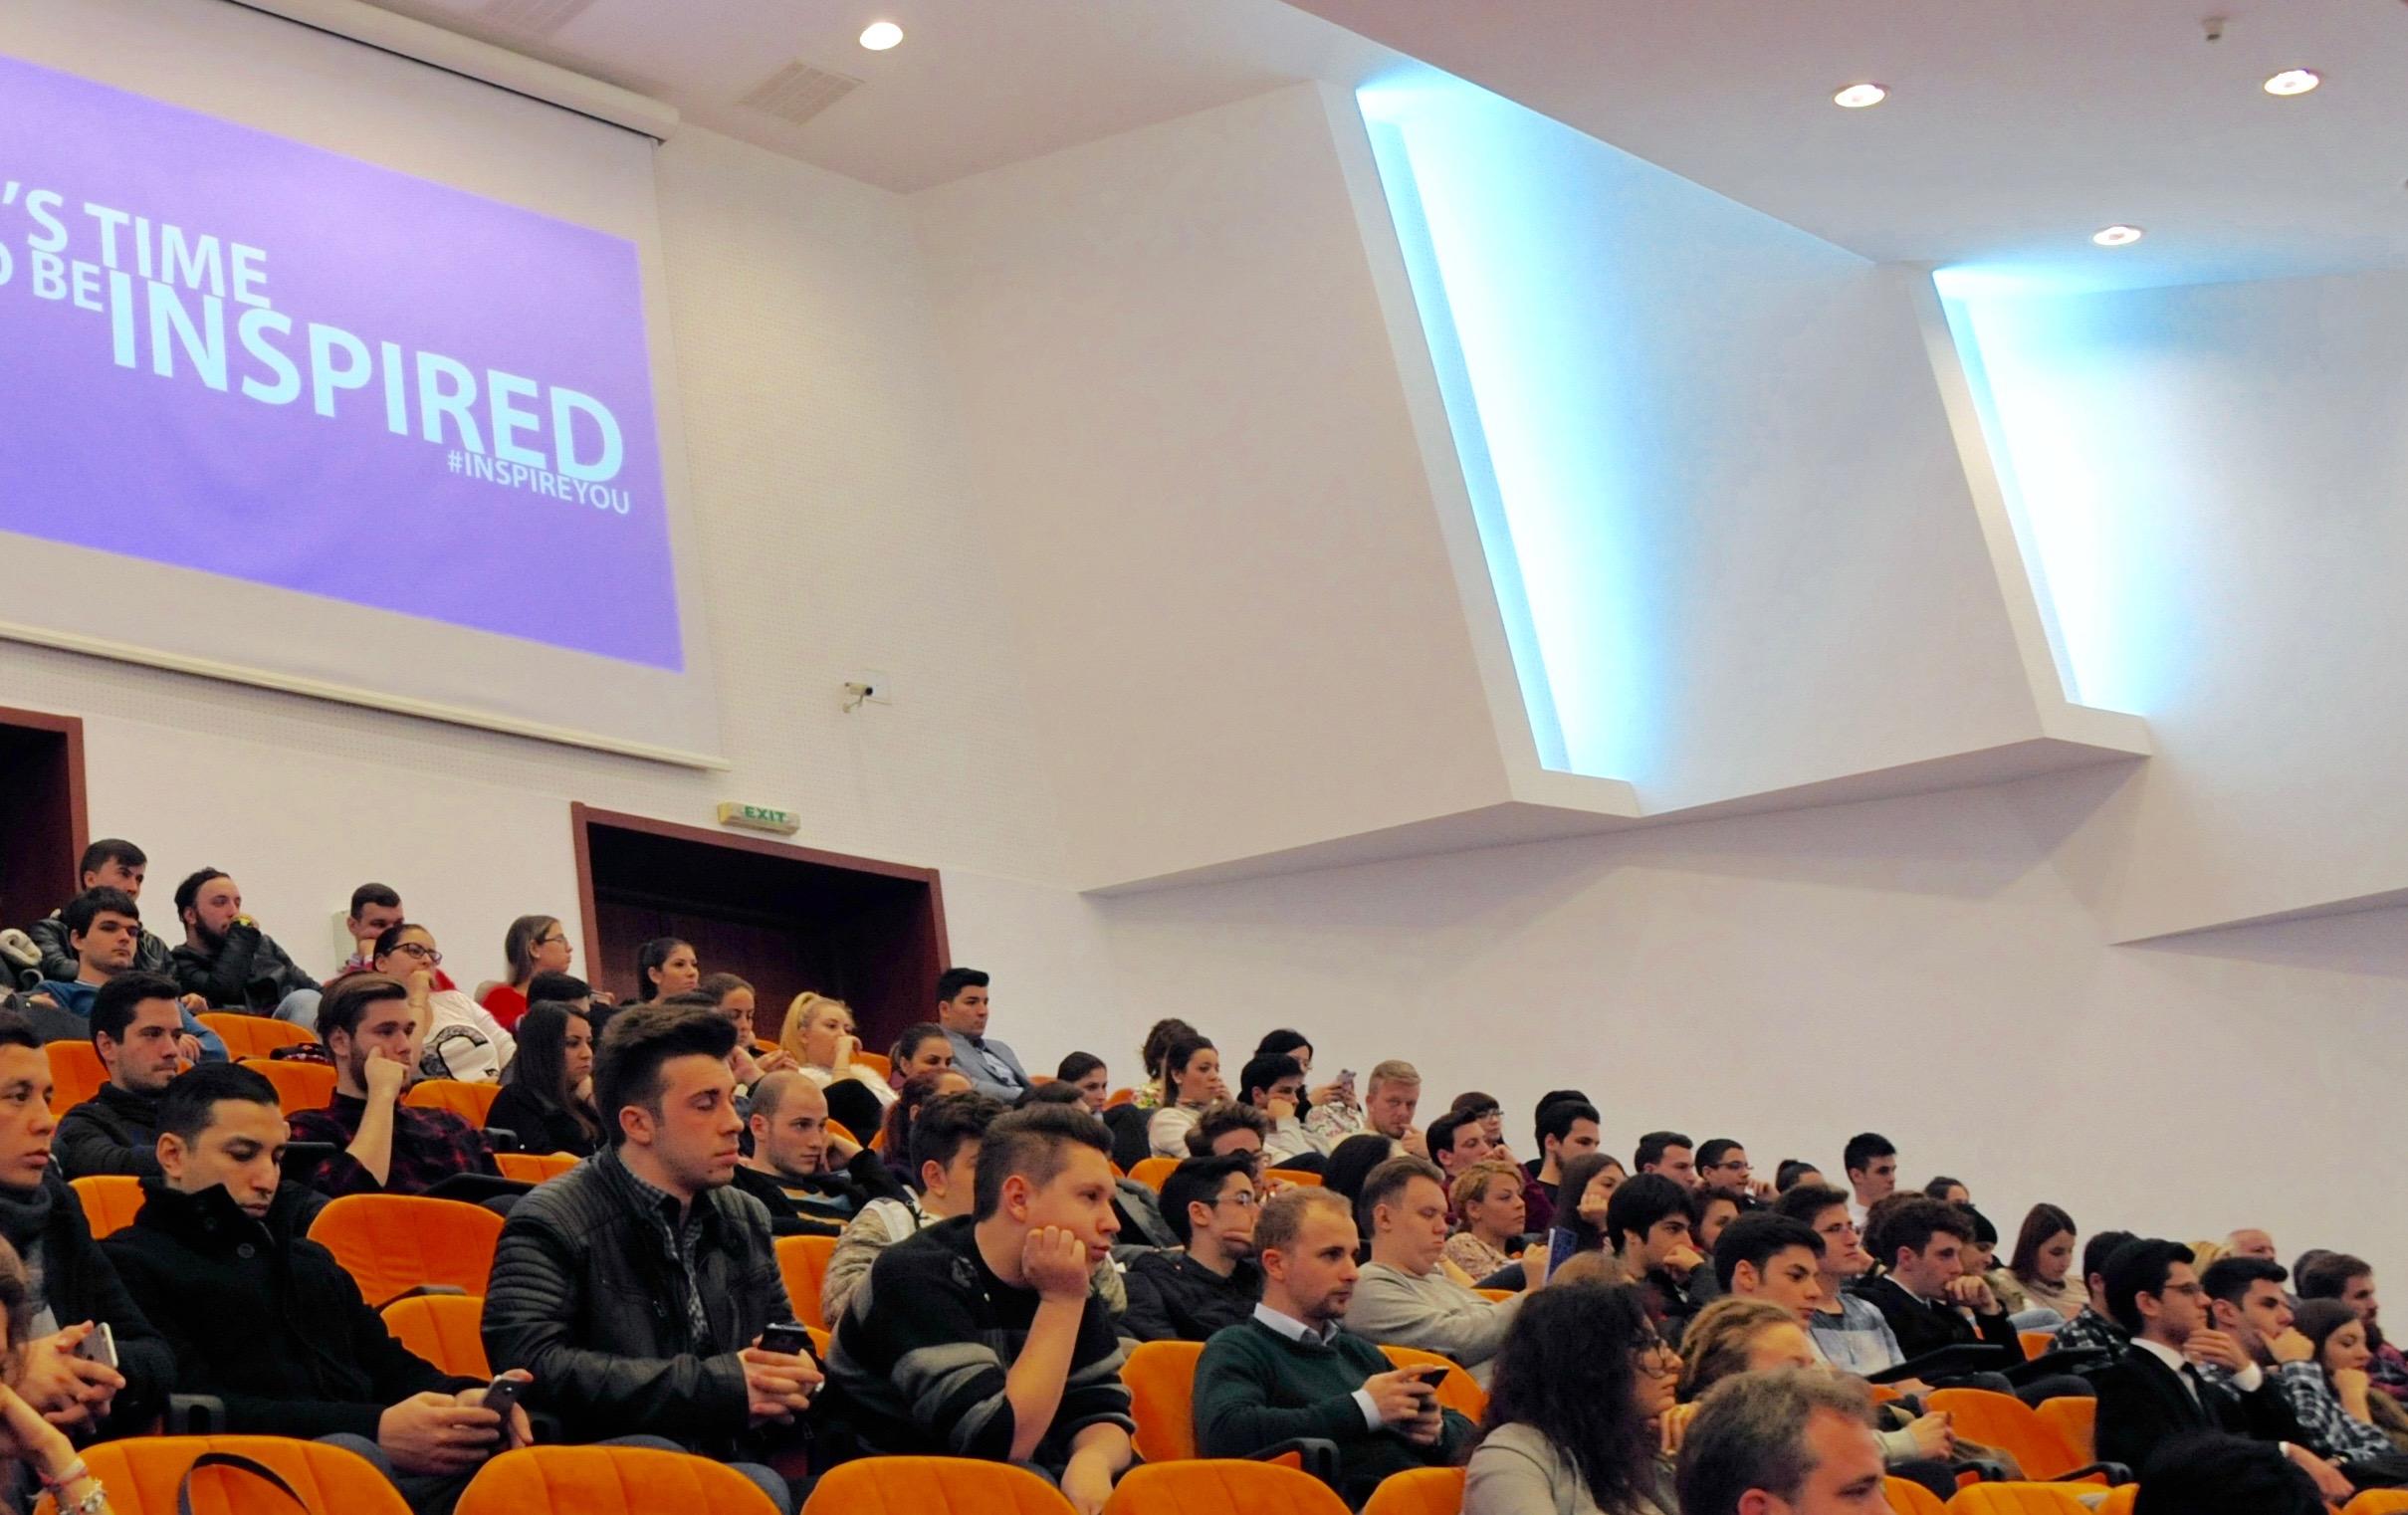 University Crowd